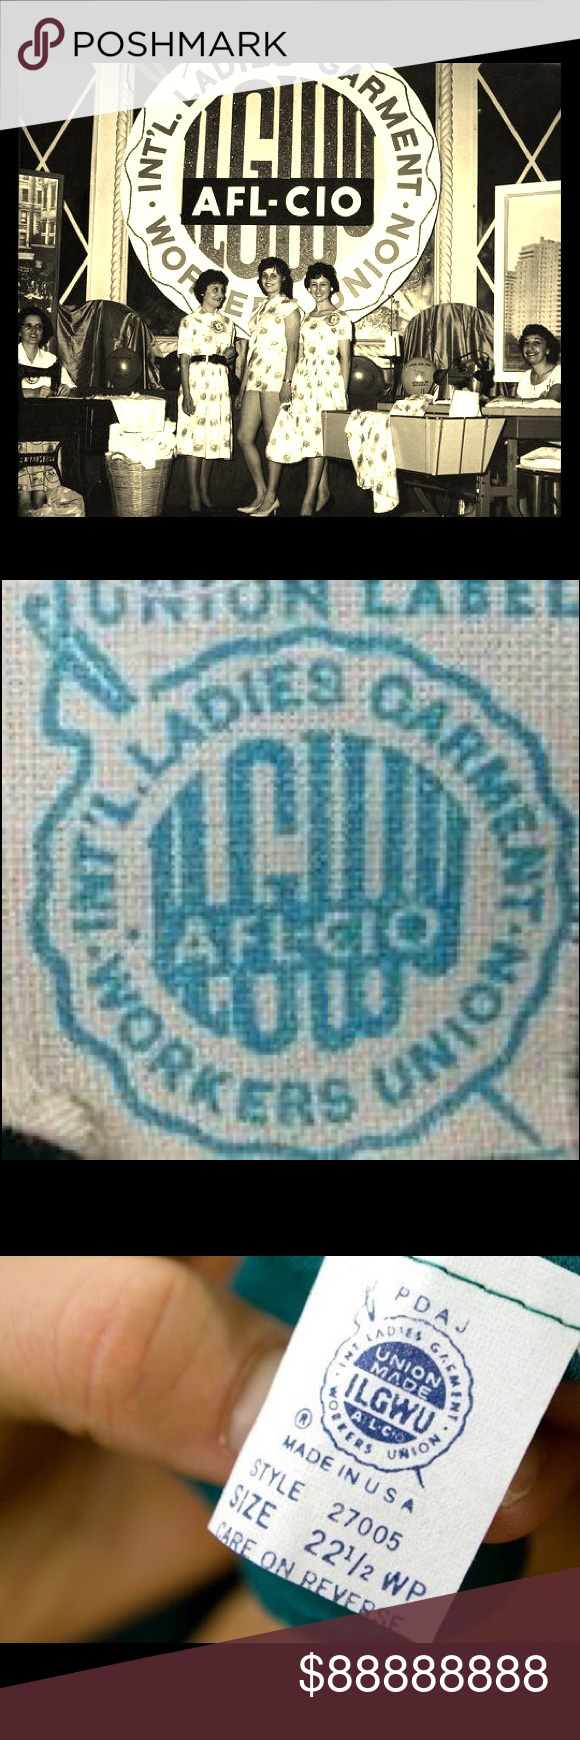 Ladies garment union labels dating